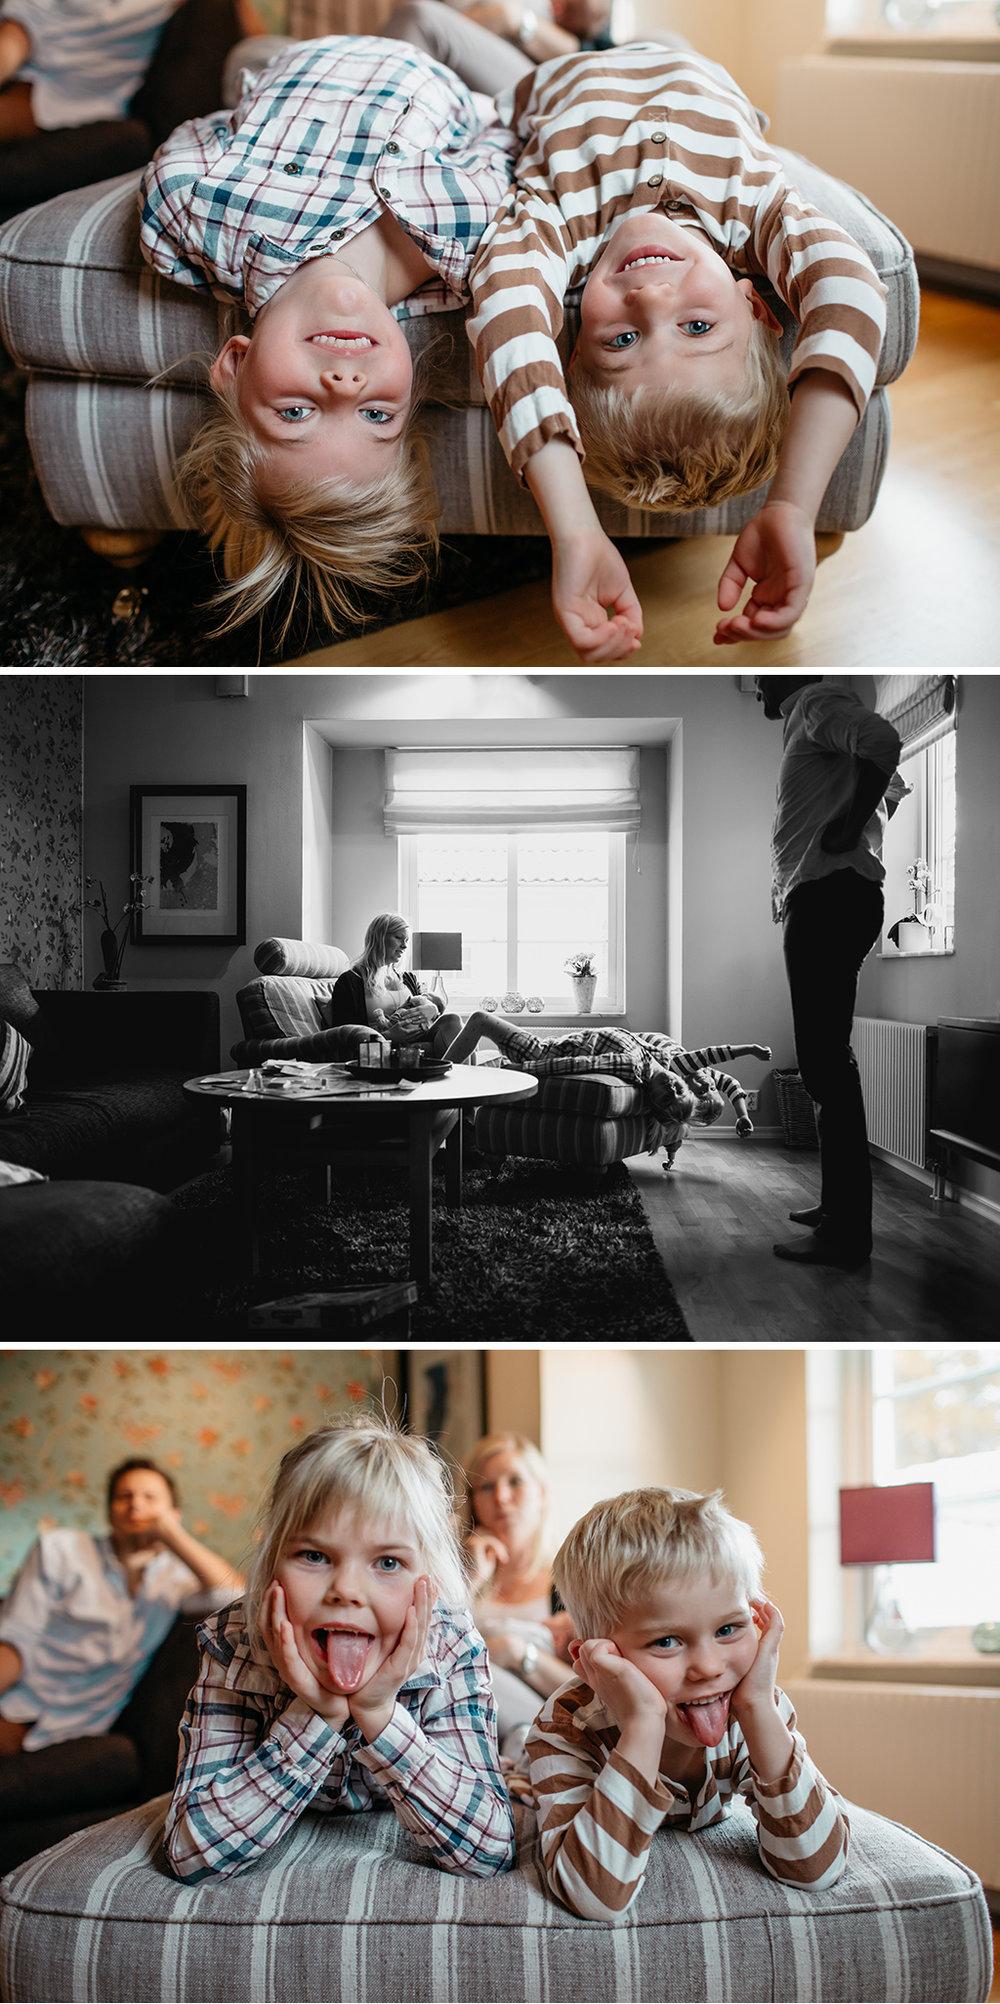 Nyfoddfotografering-lifestyle-familjefotografering-Stockholm-3.jpg